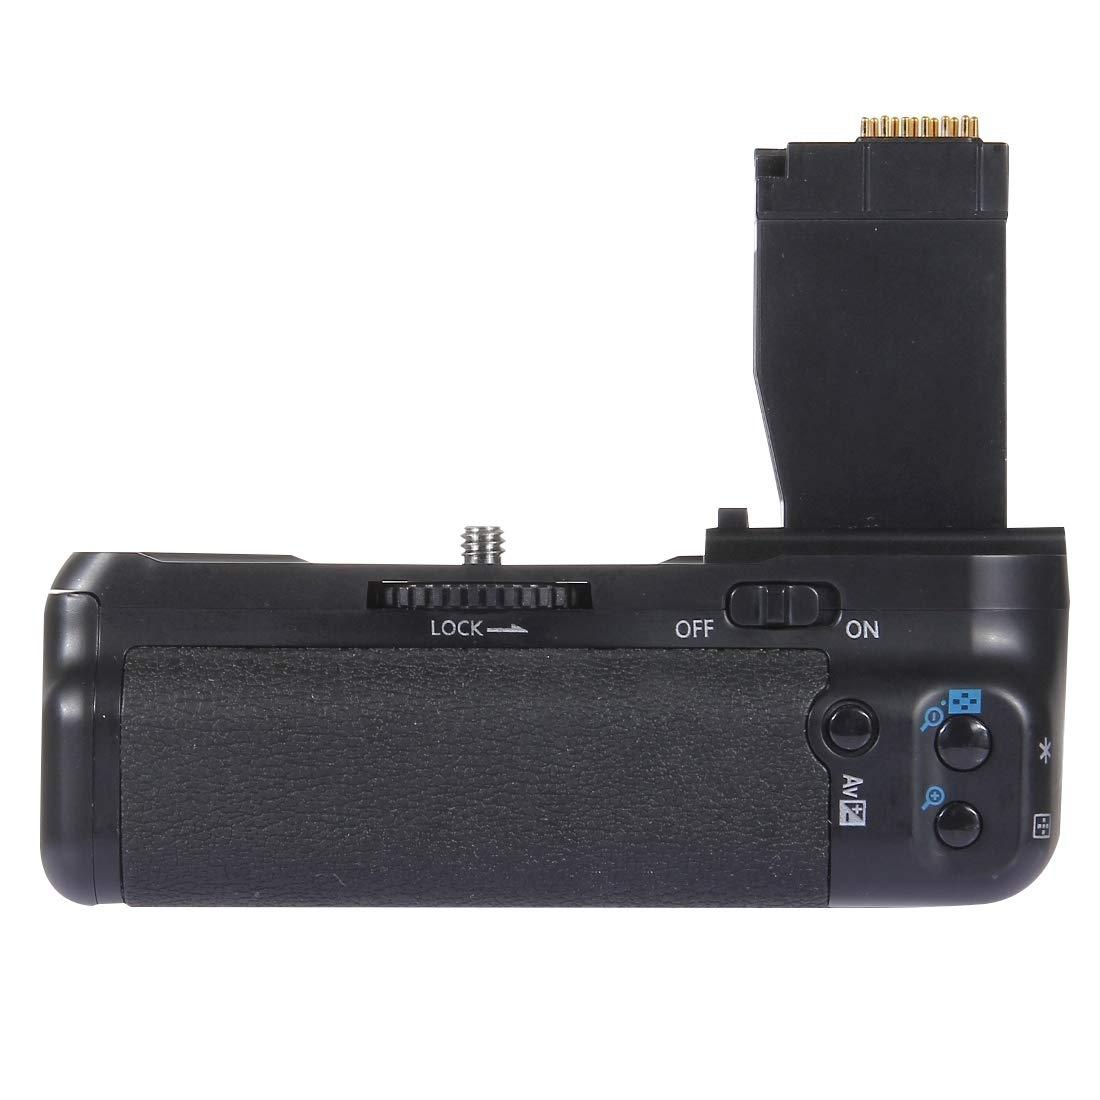 Ywzhushengmaoyi - Empuñadura de batería para cámara réflex Digital ...